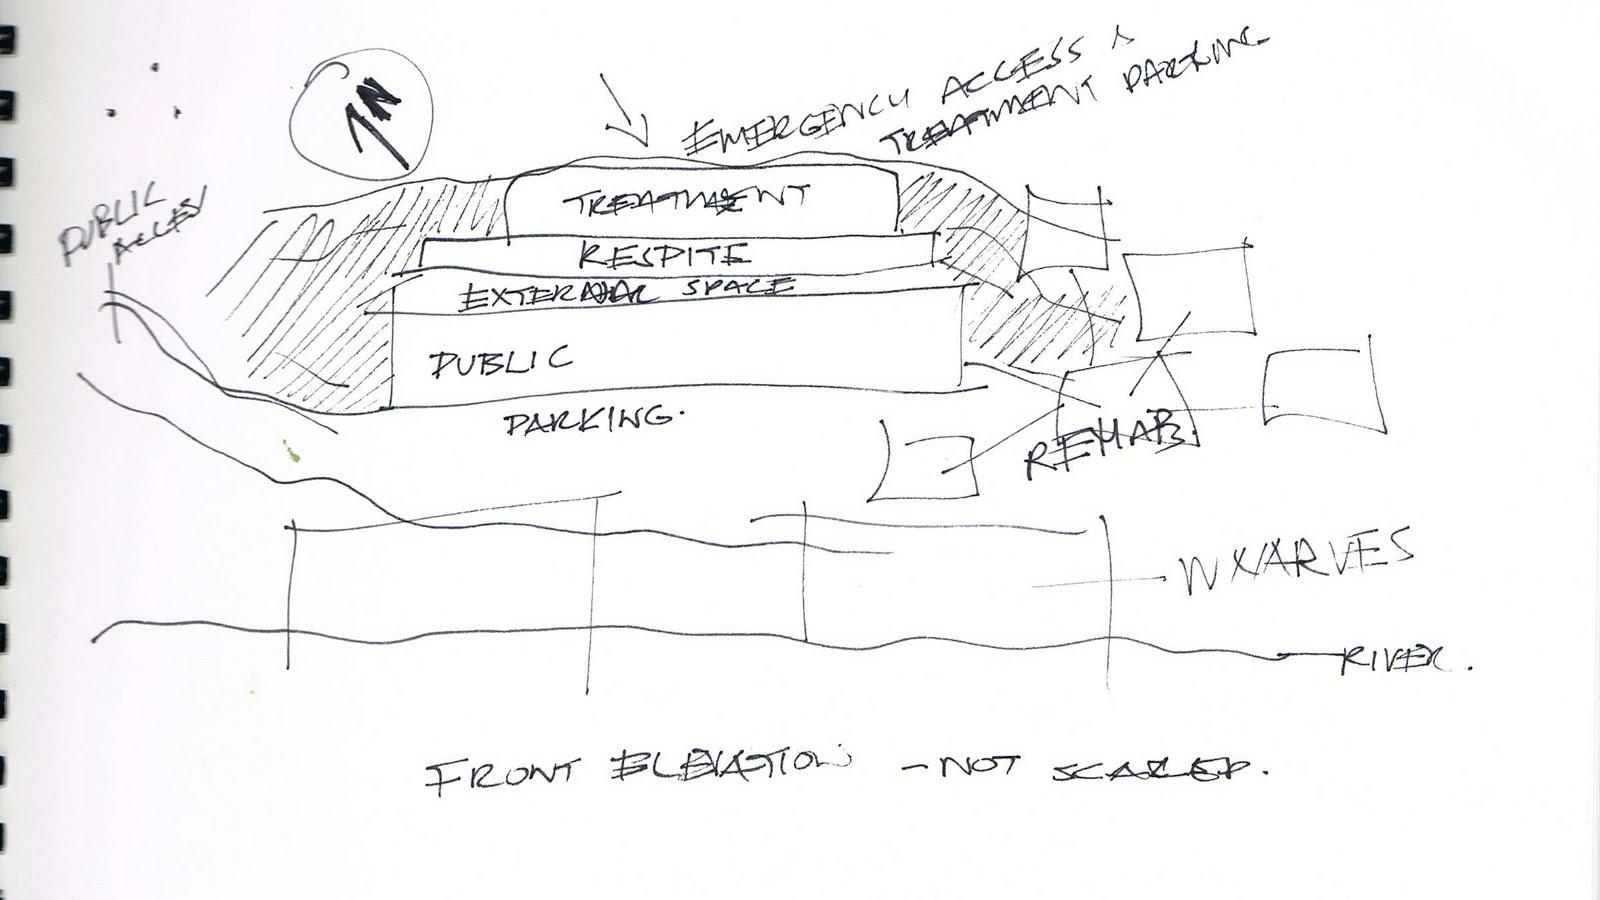 architectural design 5 program layout design